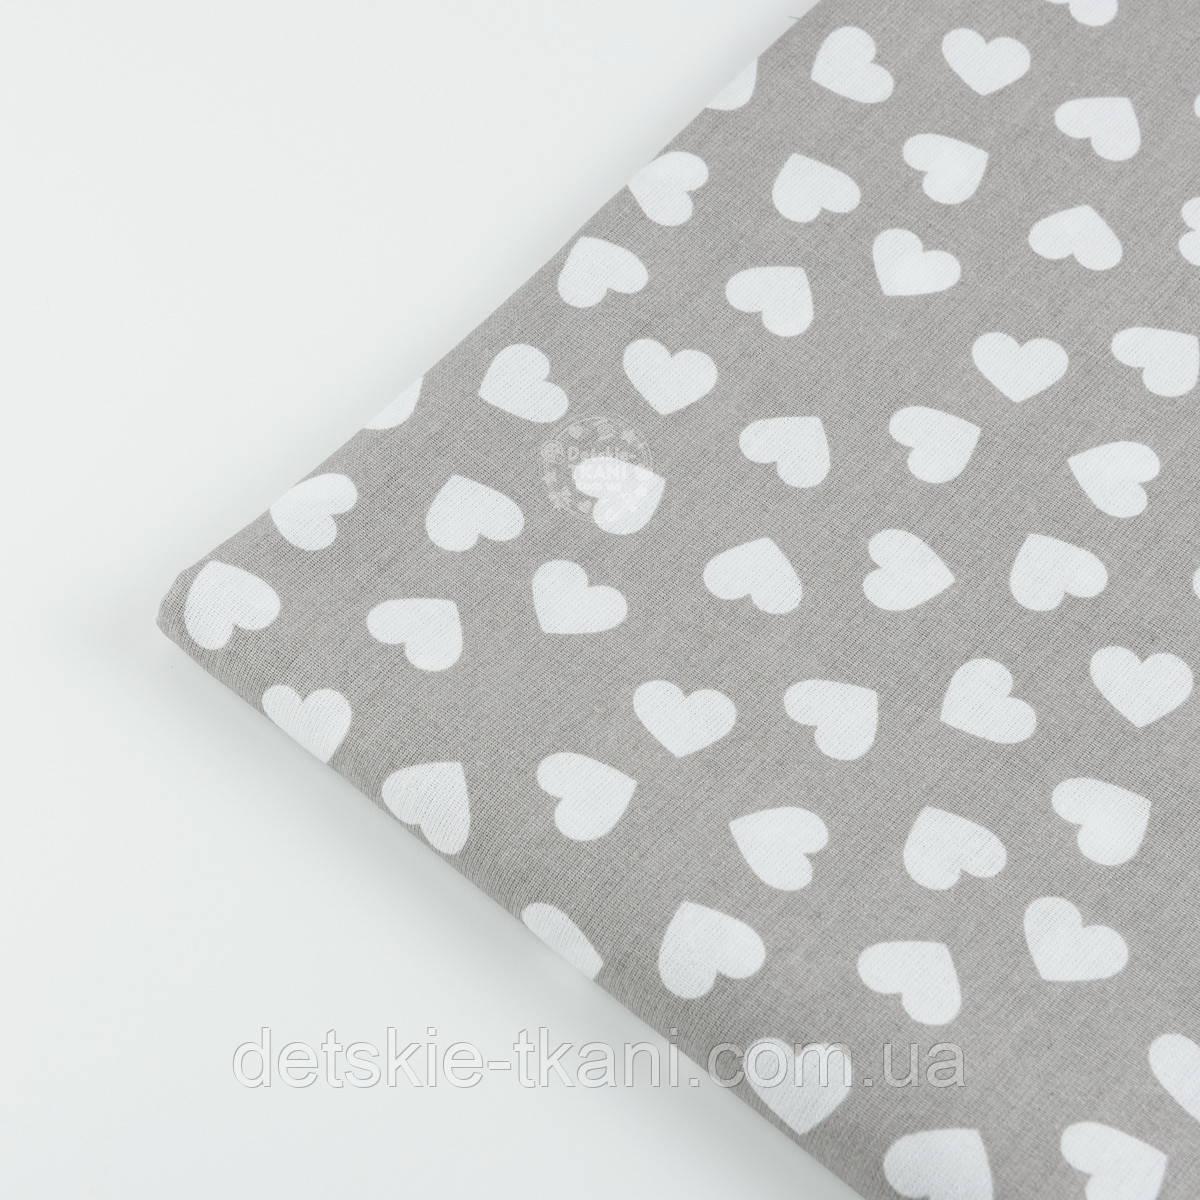 Лоскут ткани №471 с разносторонними сердечками 15 мм на сером фоне